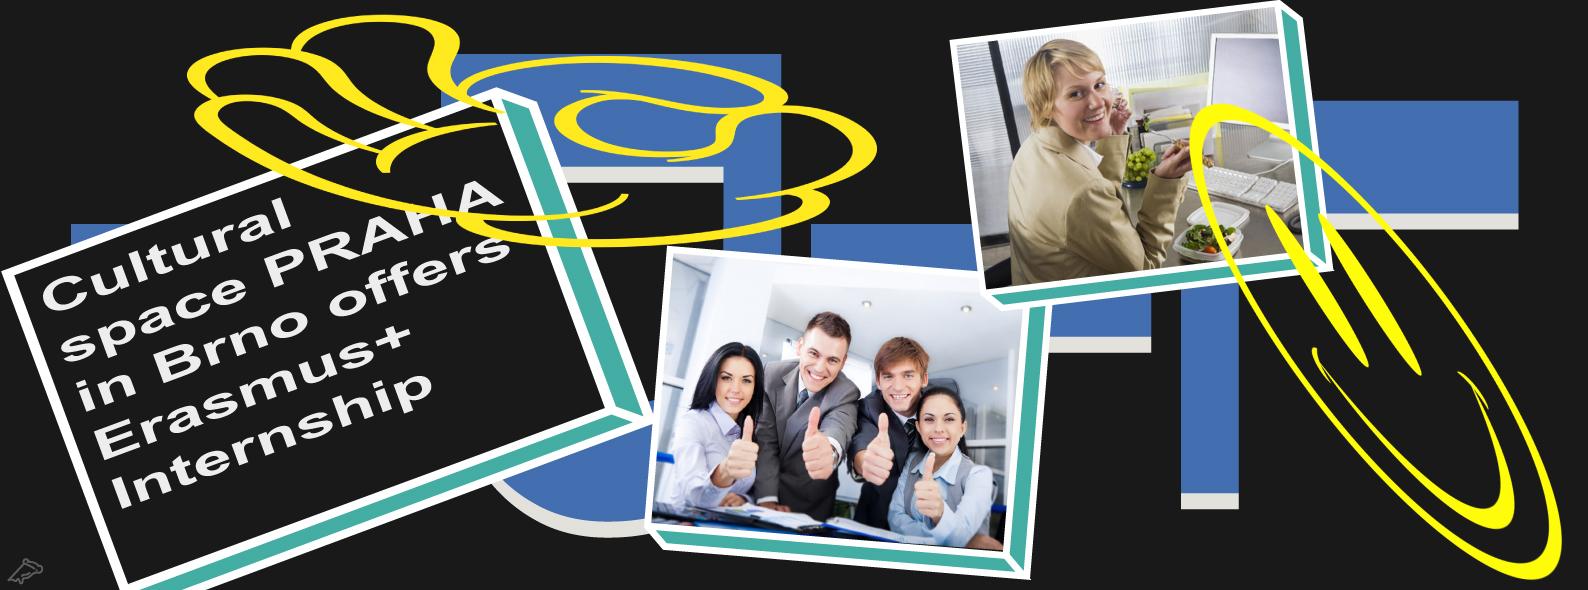 ERASMUS+ INTERNSHIP / EVS / PRAX PRO STUDENTY